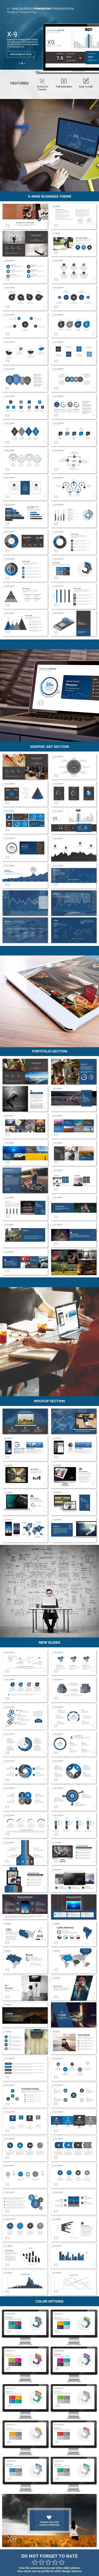 X-9 Version 3 - Premium  #medicine #advertisement #ecomerce #seo #corporate •…